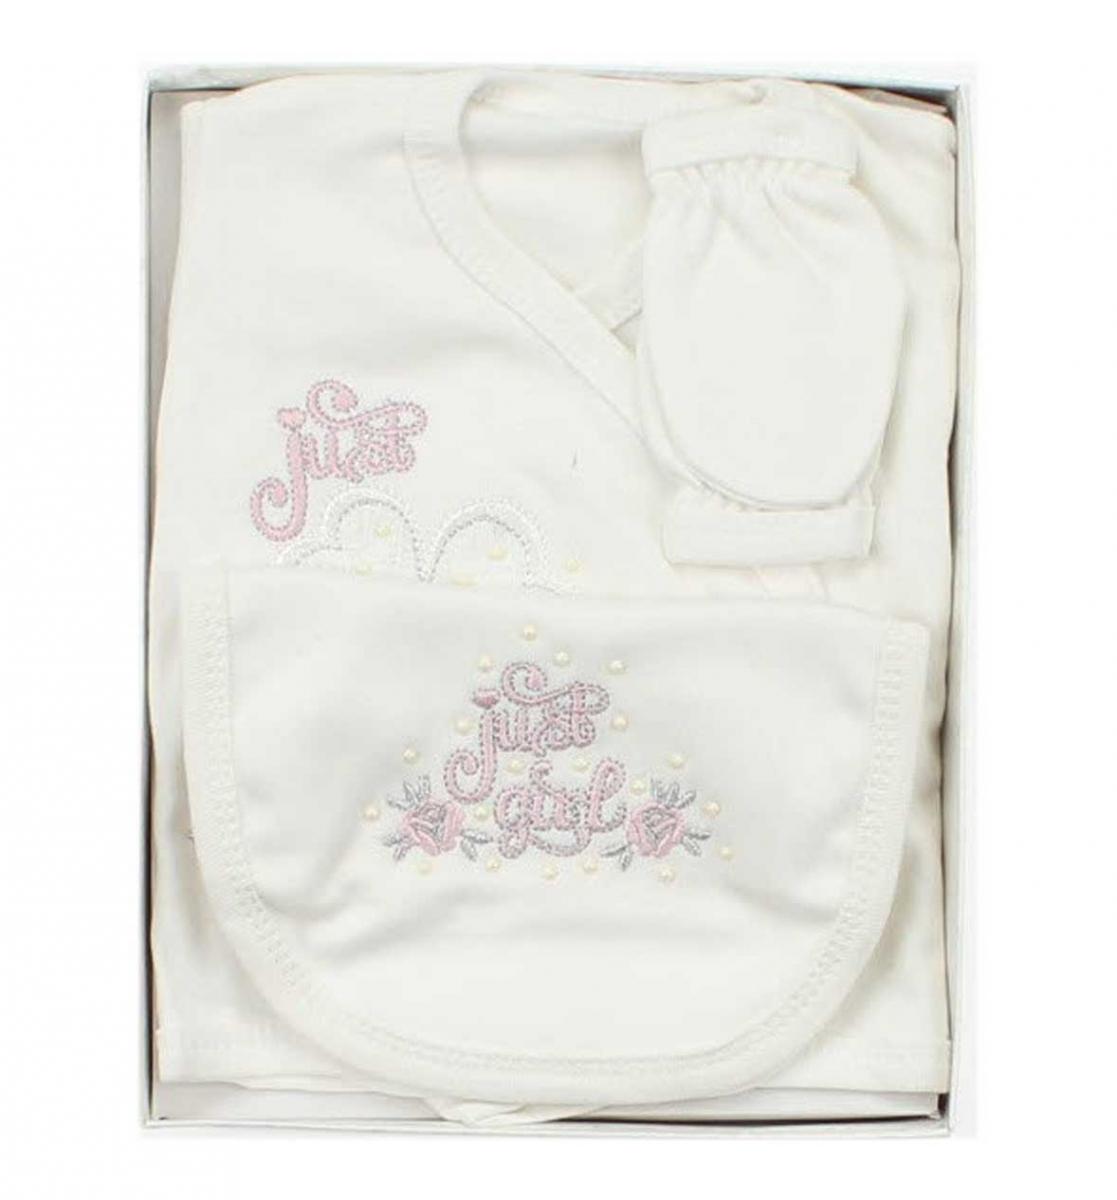 Donino Baby Kız Bebek 5 li Hastane Çıkışı 019-1501-028